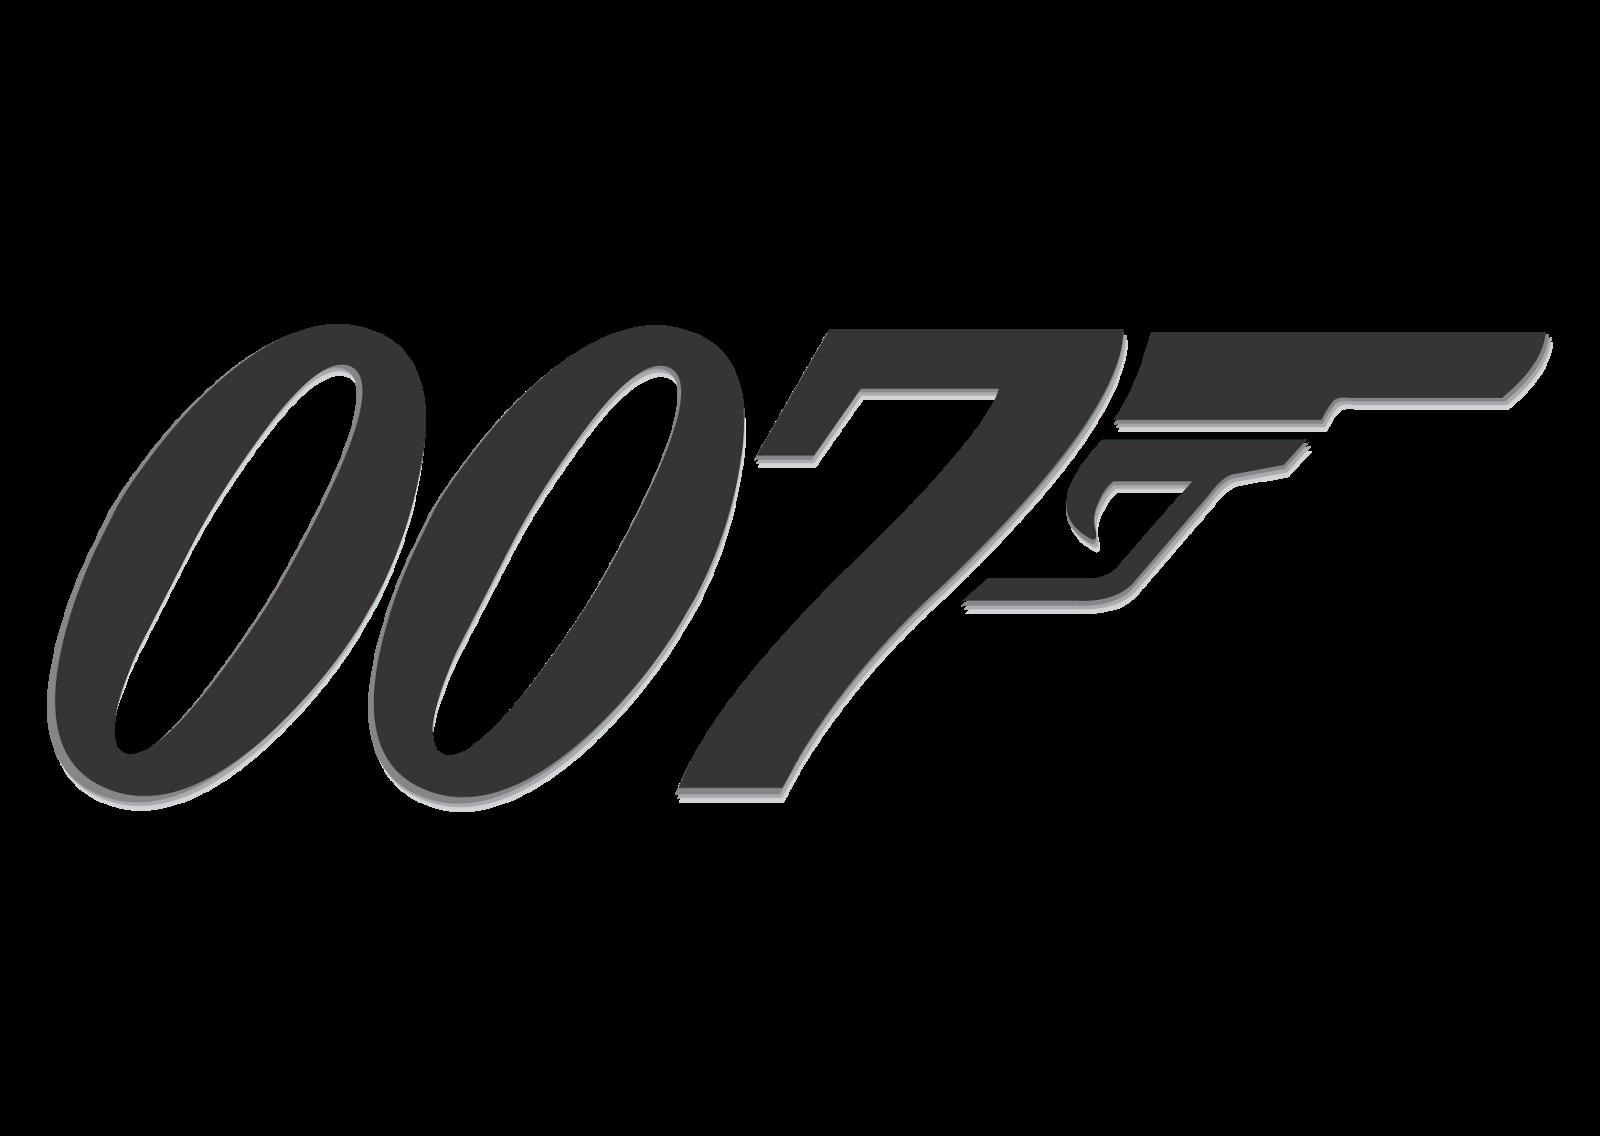 007 Logo Vector~ Format Cdr, Ai, Eps, Svg, PDF, PNG